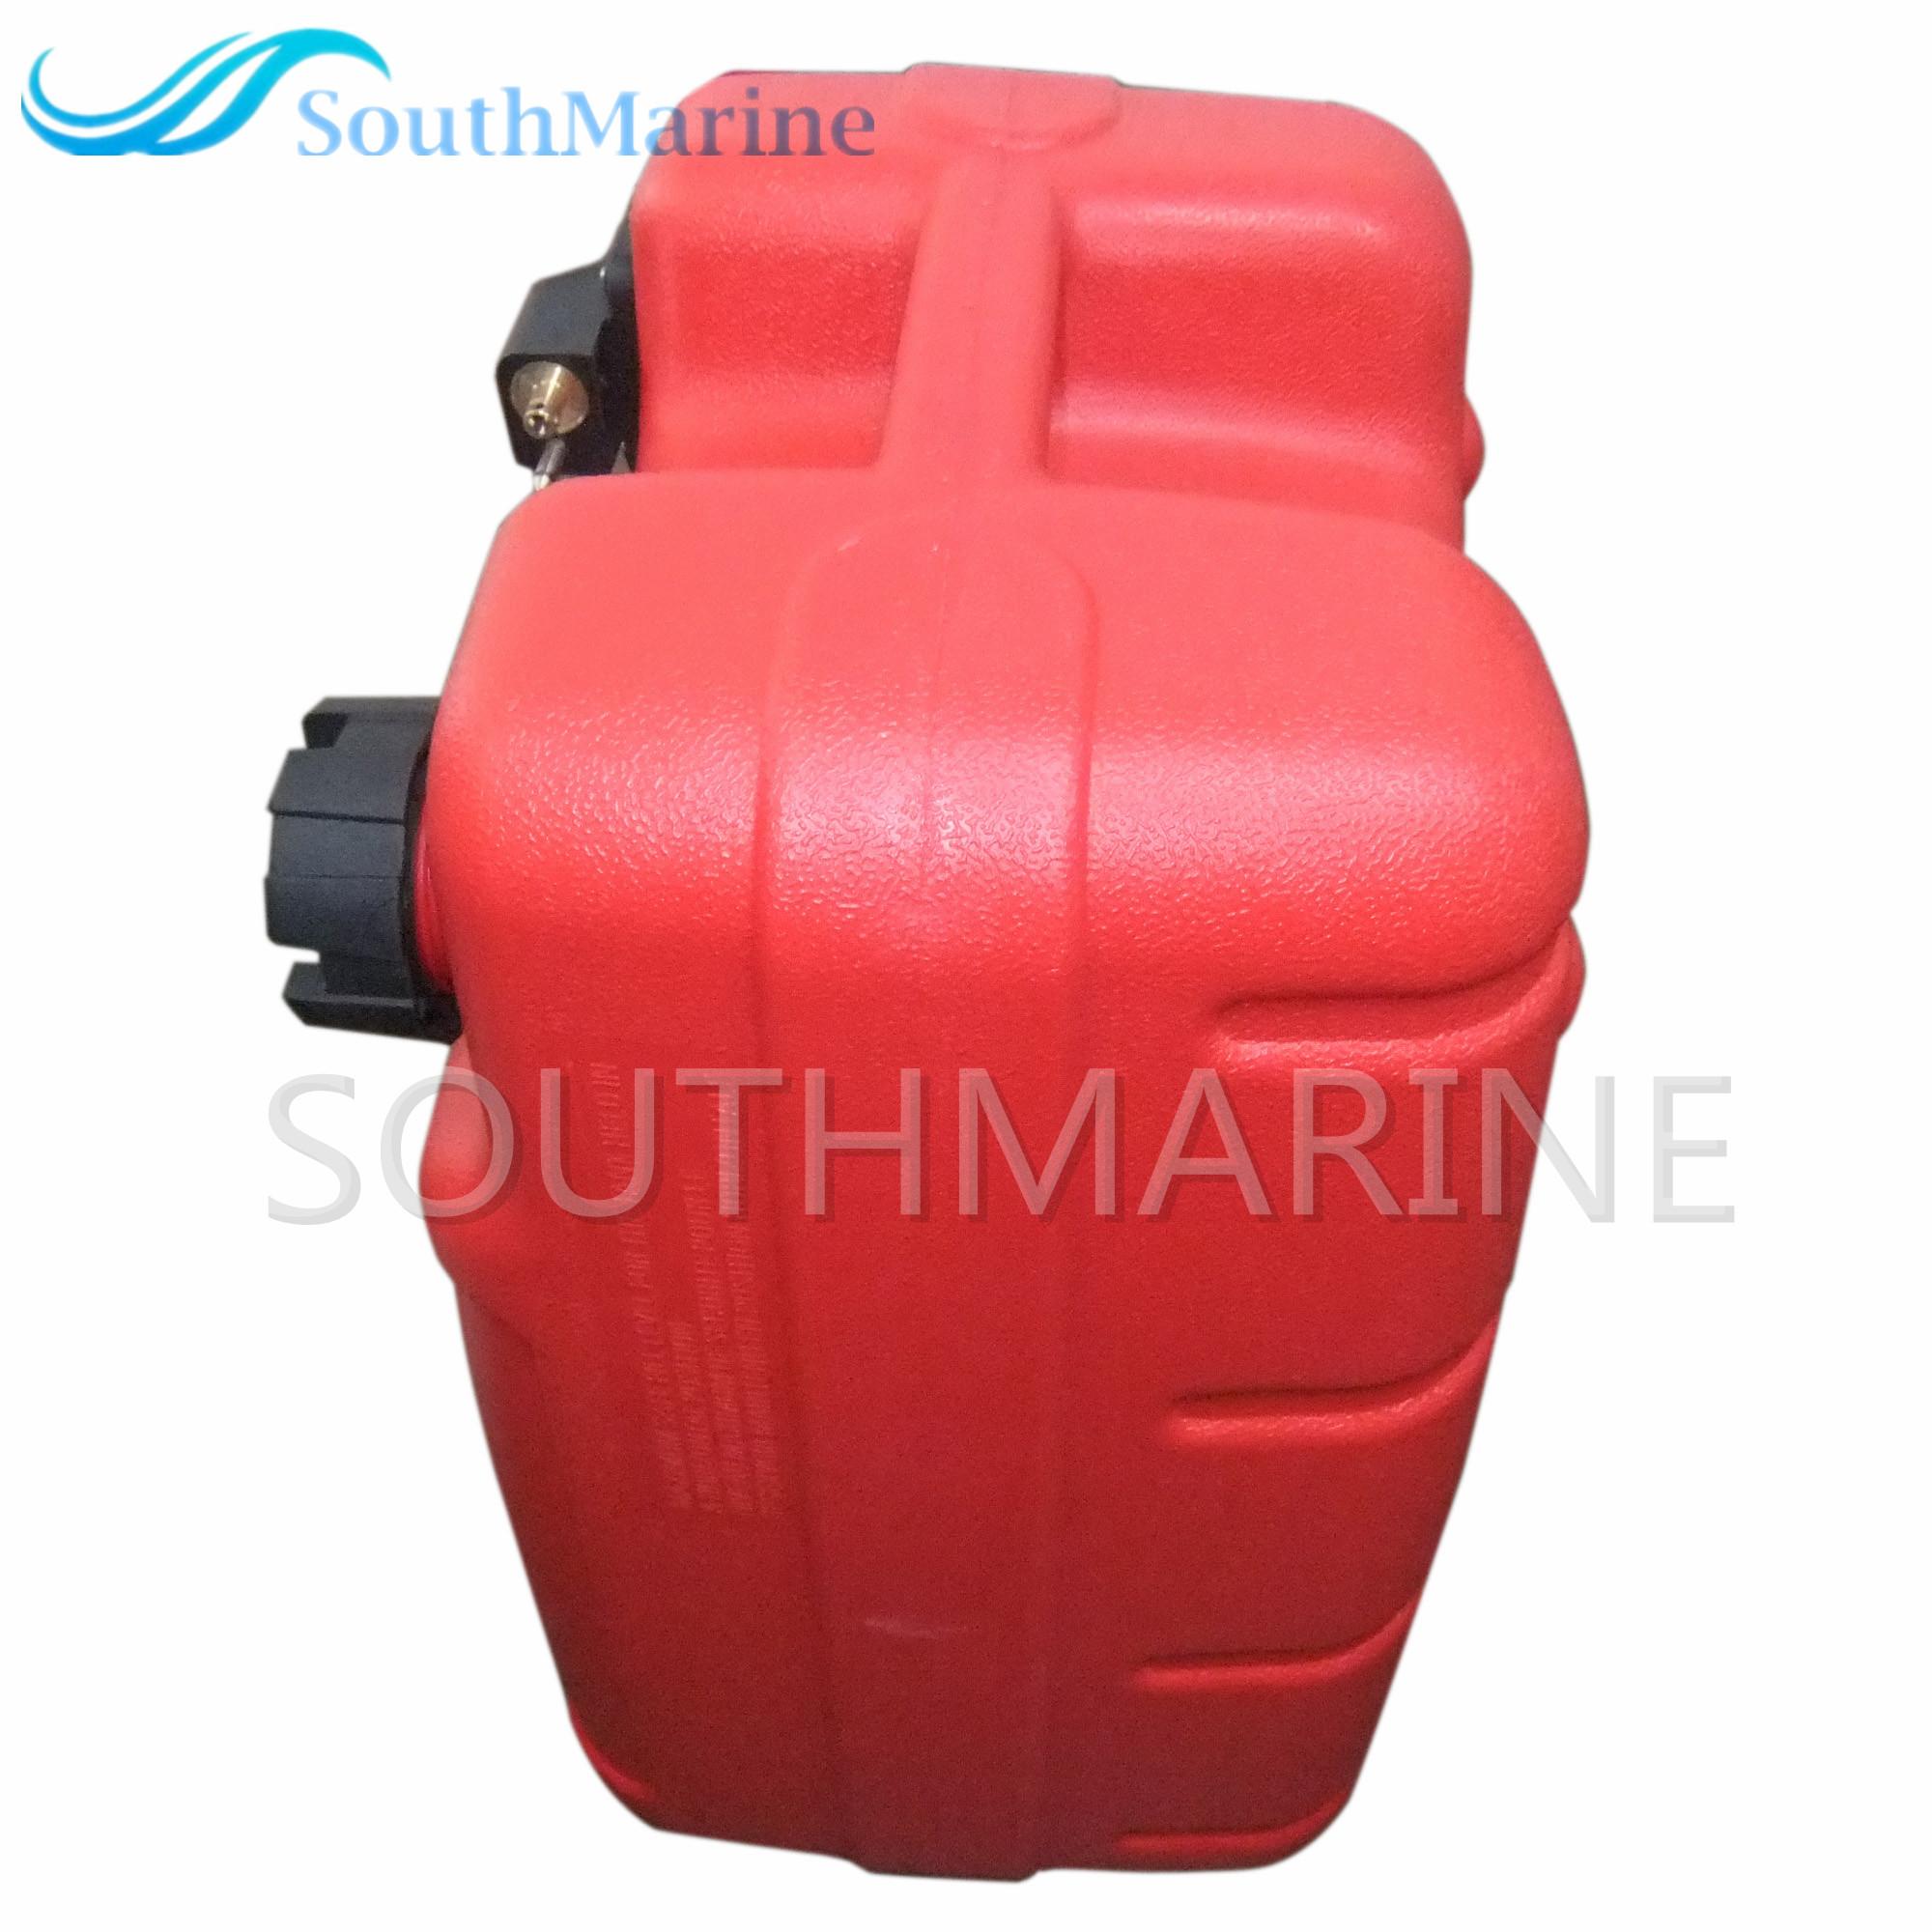 thelastplanet Bid/ón para Combustible para Sea Yum Yamaha Hangkai Fuerabordas Recipientes para Gasolina Bid/ón para Gasolina 12L 24L